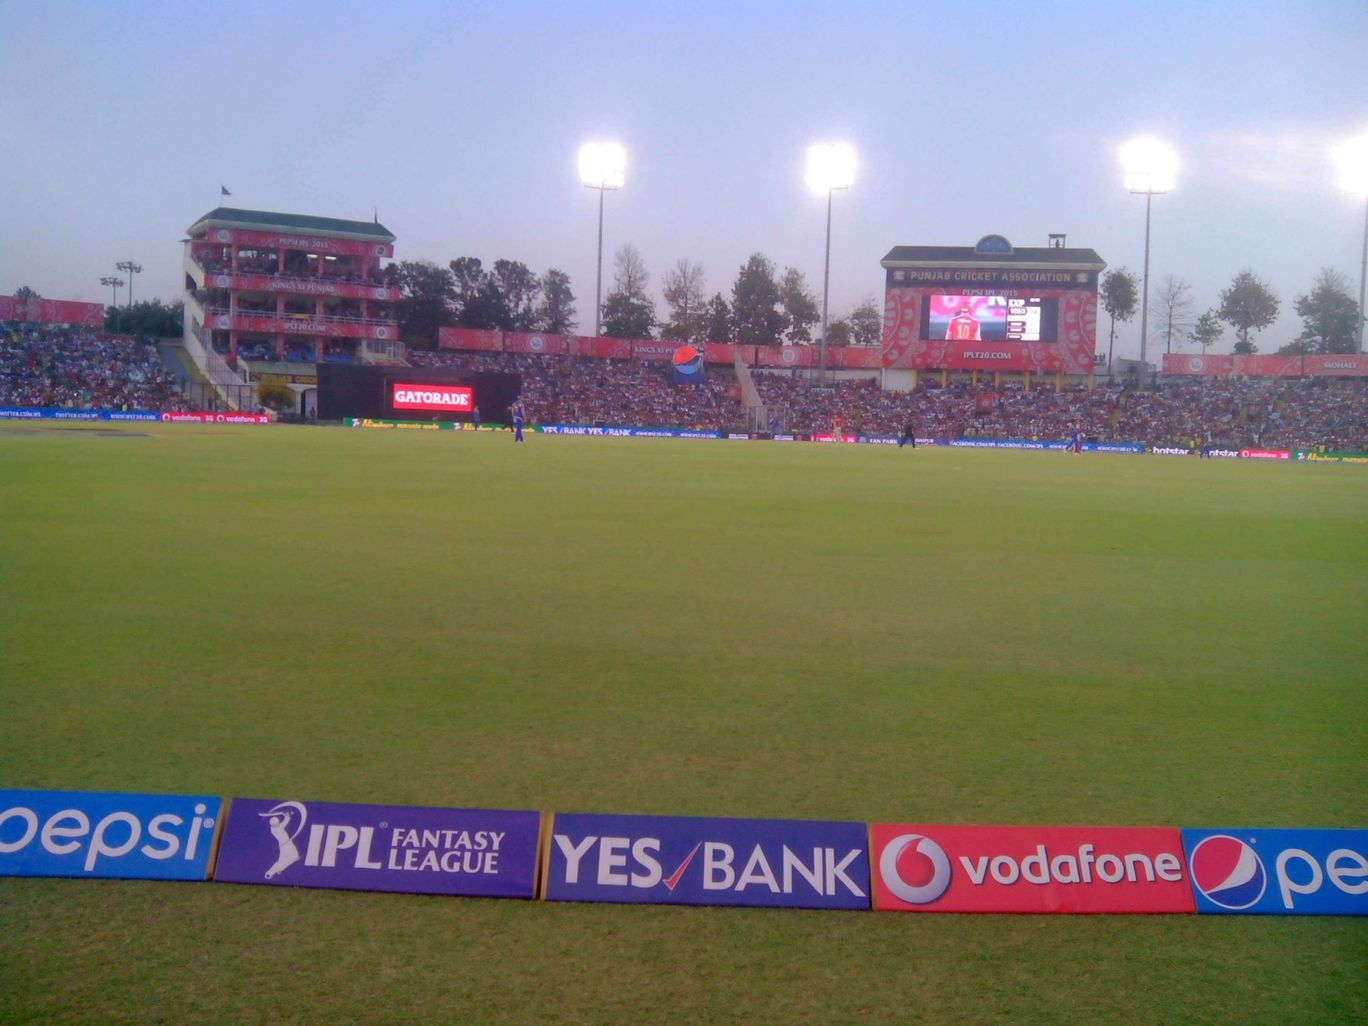 Photo of Punjab Cricket Association Stadium By Vijay Rana